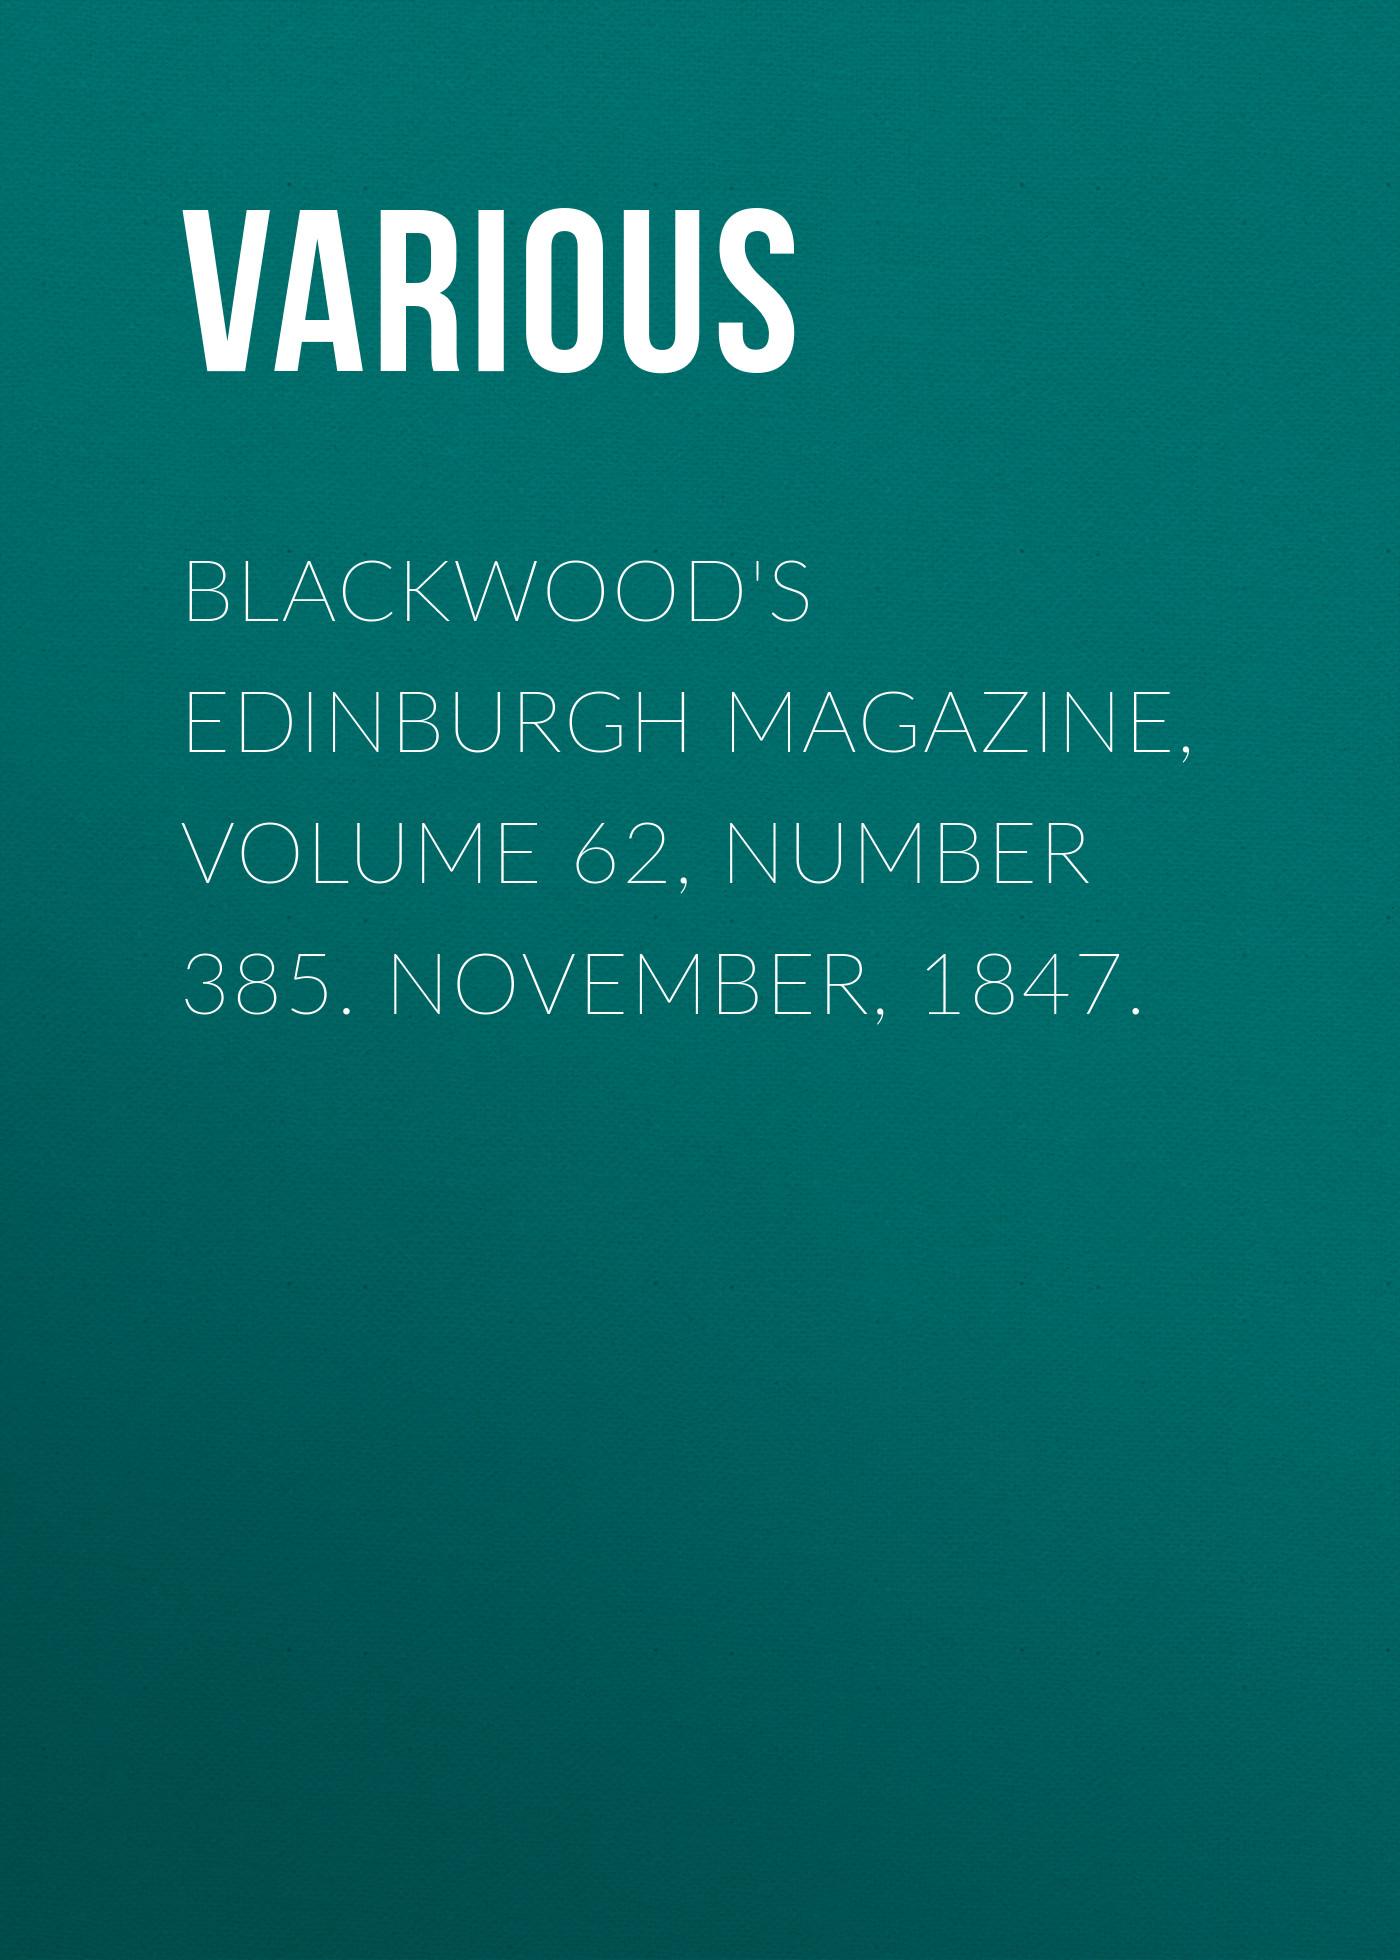 Various Blackwood's Edinburgh Magazine, Volume 62, Number 385. November, 1847. various blackwood s edinburgh magazine volume 62 number 385 november 1847